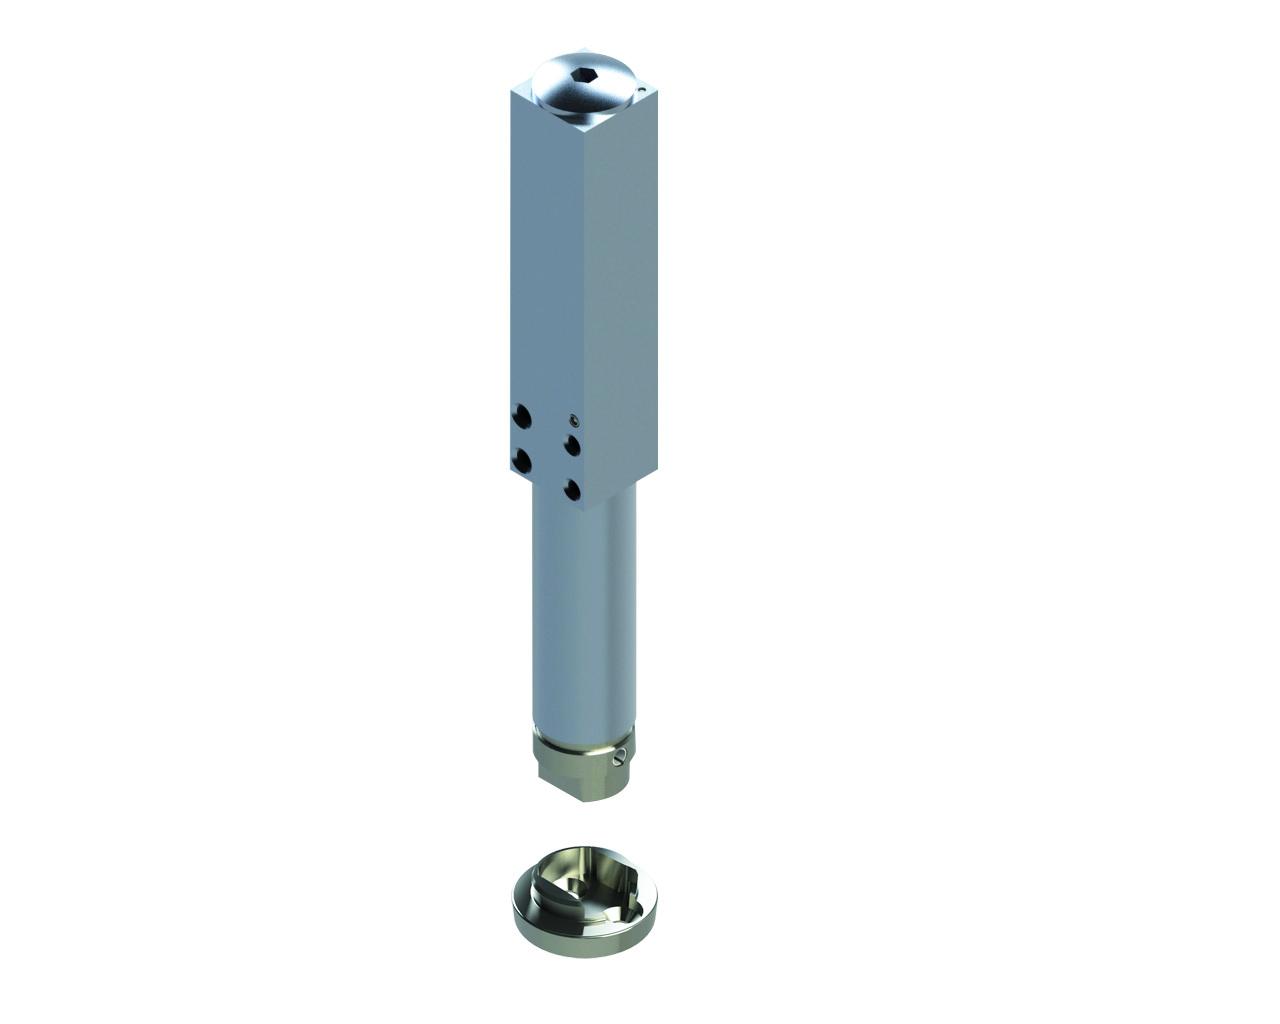 Biloba Evo VELA – Hidden Hydraulic Hinge For Framed Doors With s Stop